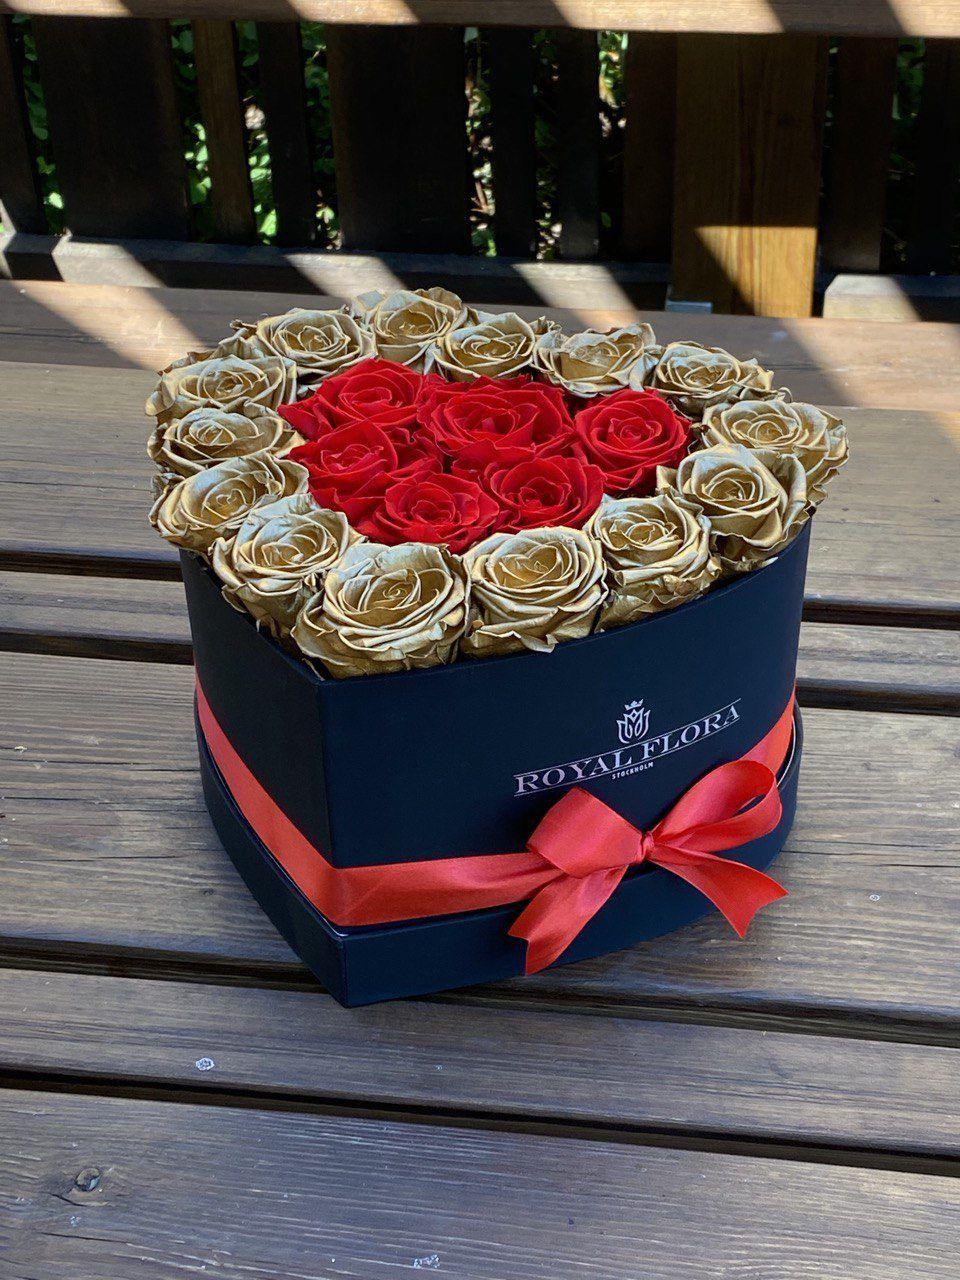 ❤️ The simplicity of a rose is what makes it so beautiful! ❤️     #Royalflorastockholm #evighetsrosor #luxuryrosor #Rosebox #roses #Royalflora #flowerlover #beautiful